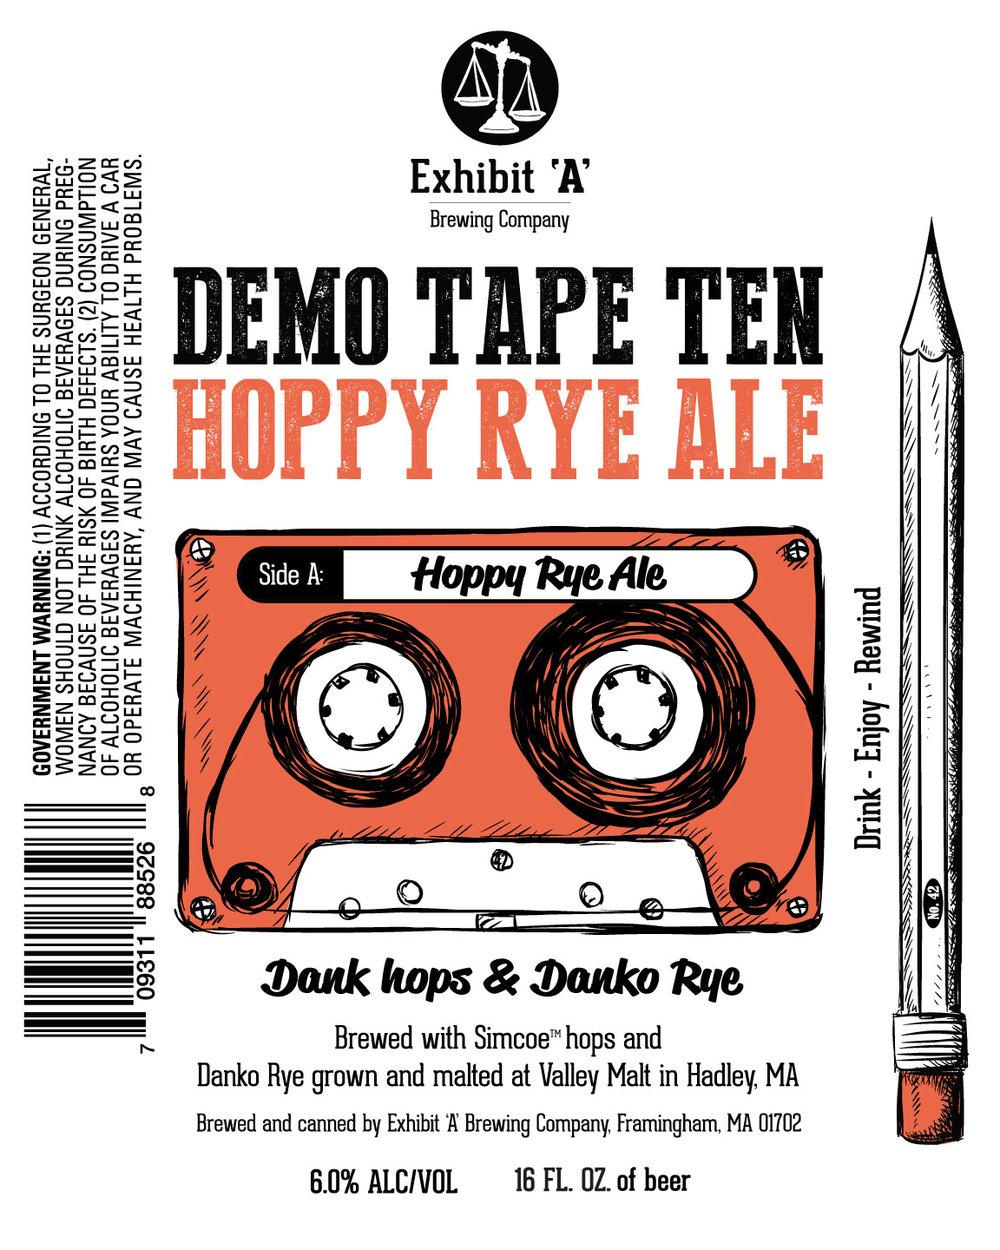 DemoTape10-HoppyRye.jpg